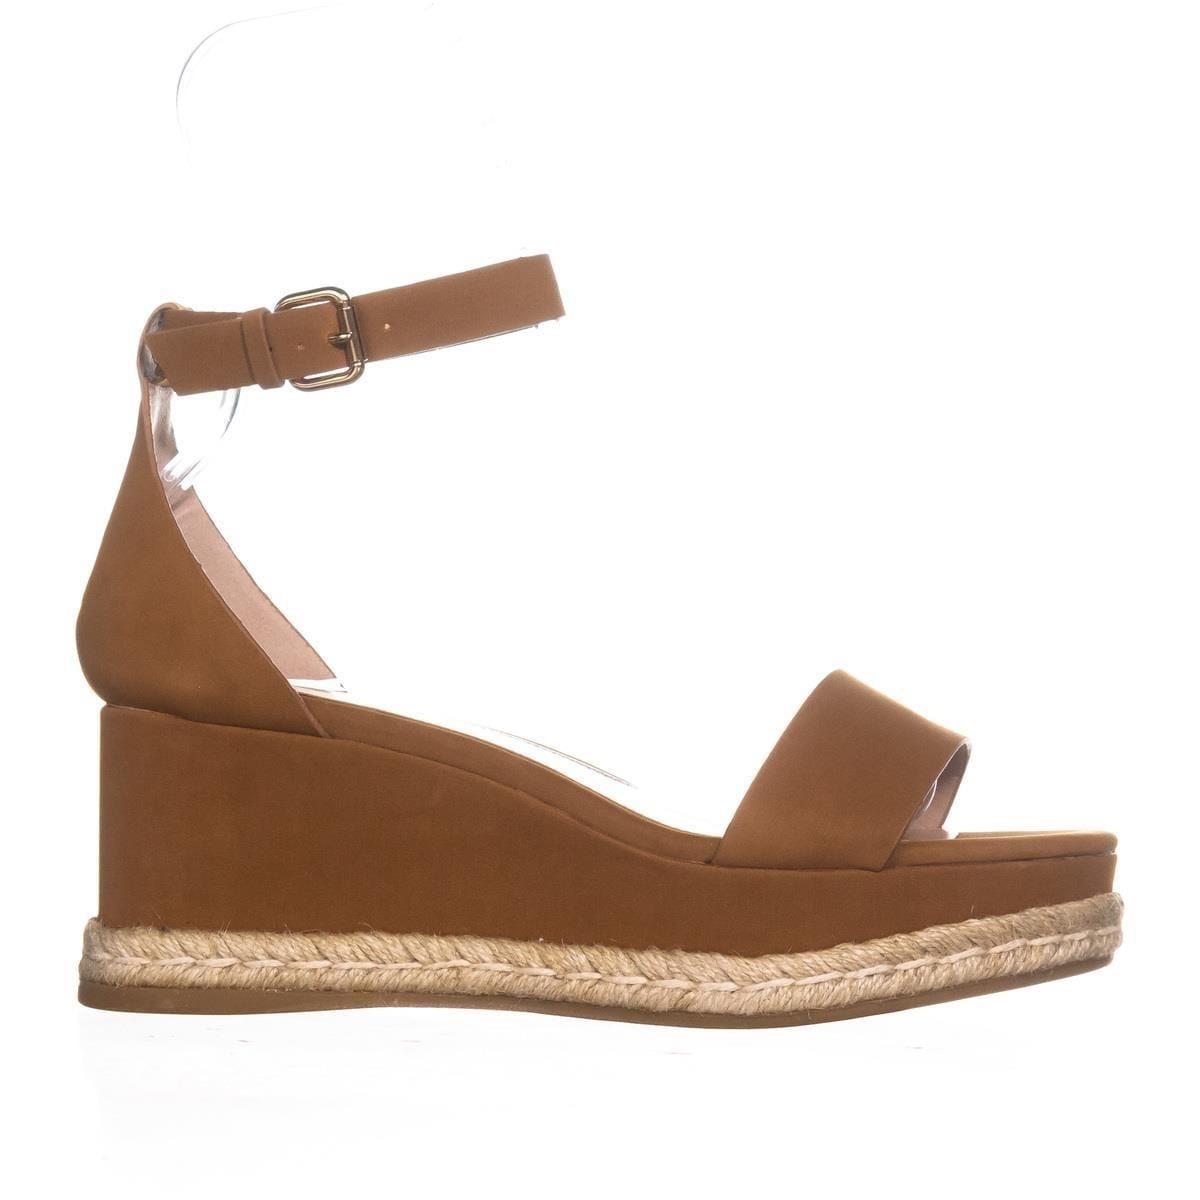 54bc030e2a0 Shop BCBGeneration Addie Espadrilles Wedge Sandals